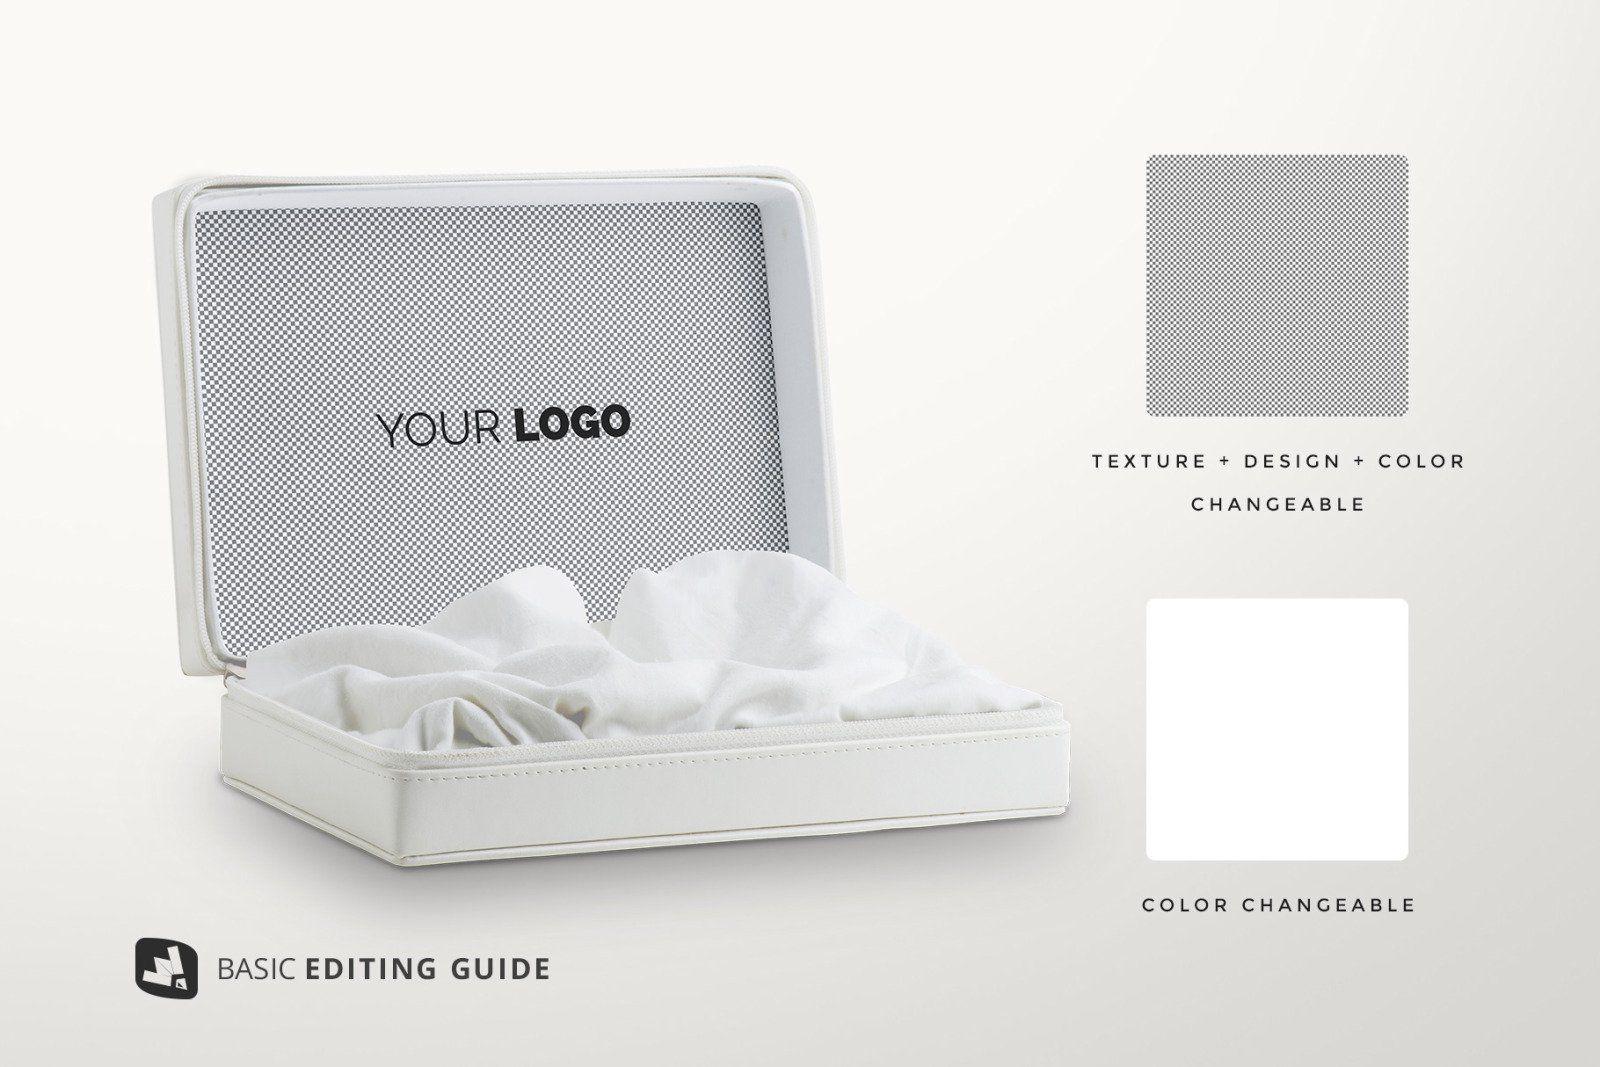 Download Clothing Packaging Mockup Premium Free Mockup Templates Stationery Brochure Device T Shirt And Packaging Mockup Clothing Packaging Clothing Mockup